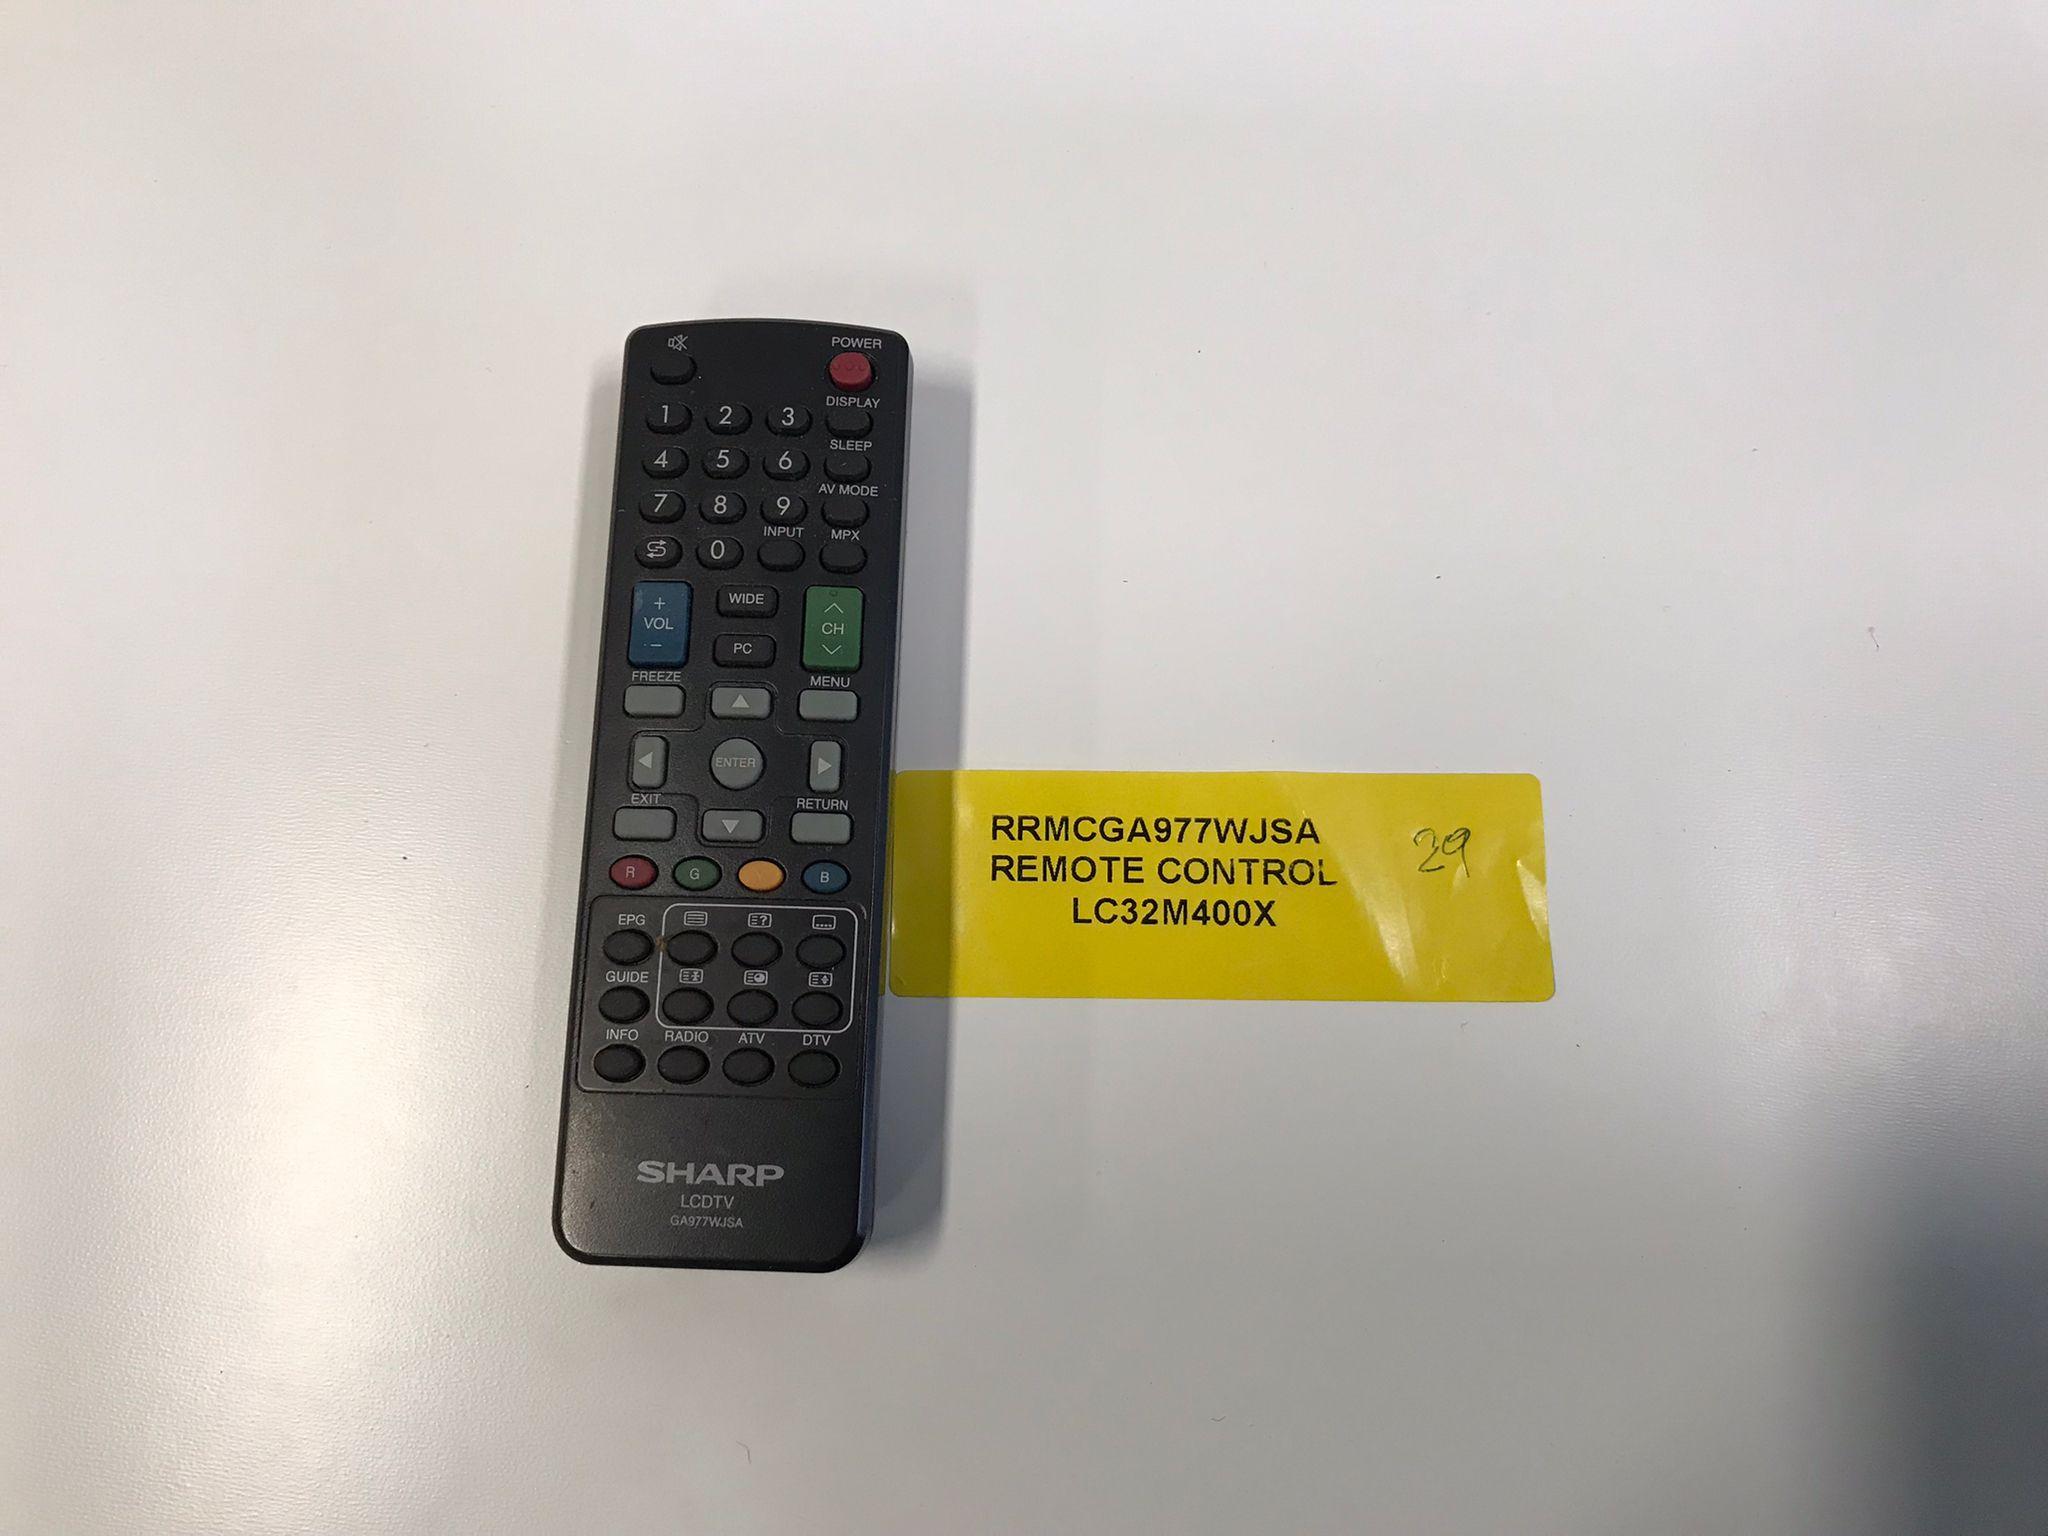 Sharp TV Remote Control RRMCGA977WJSA